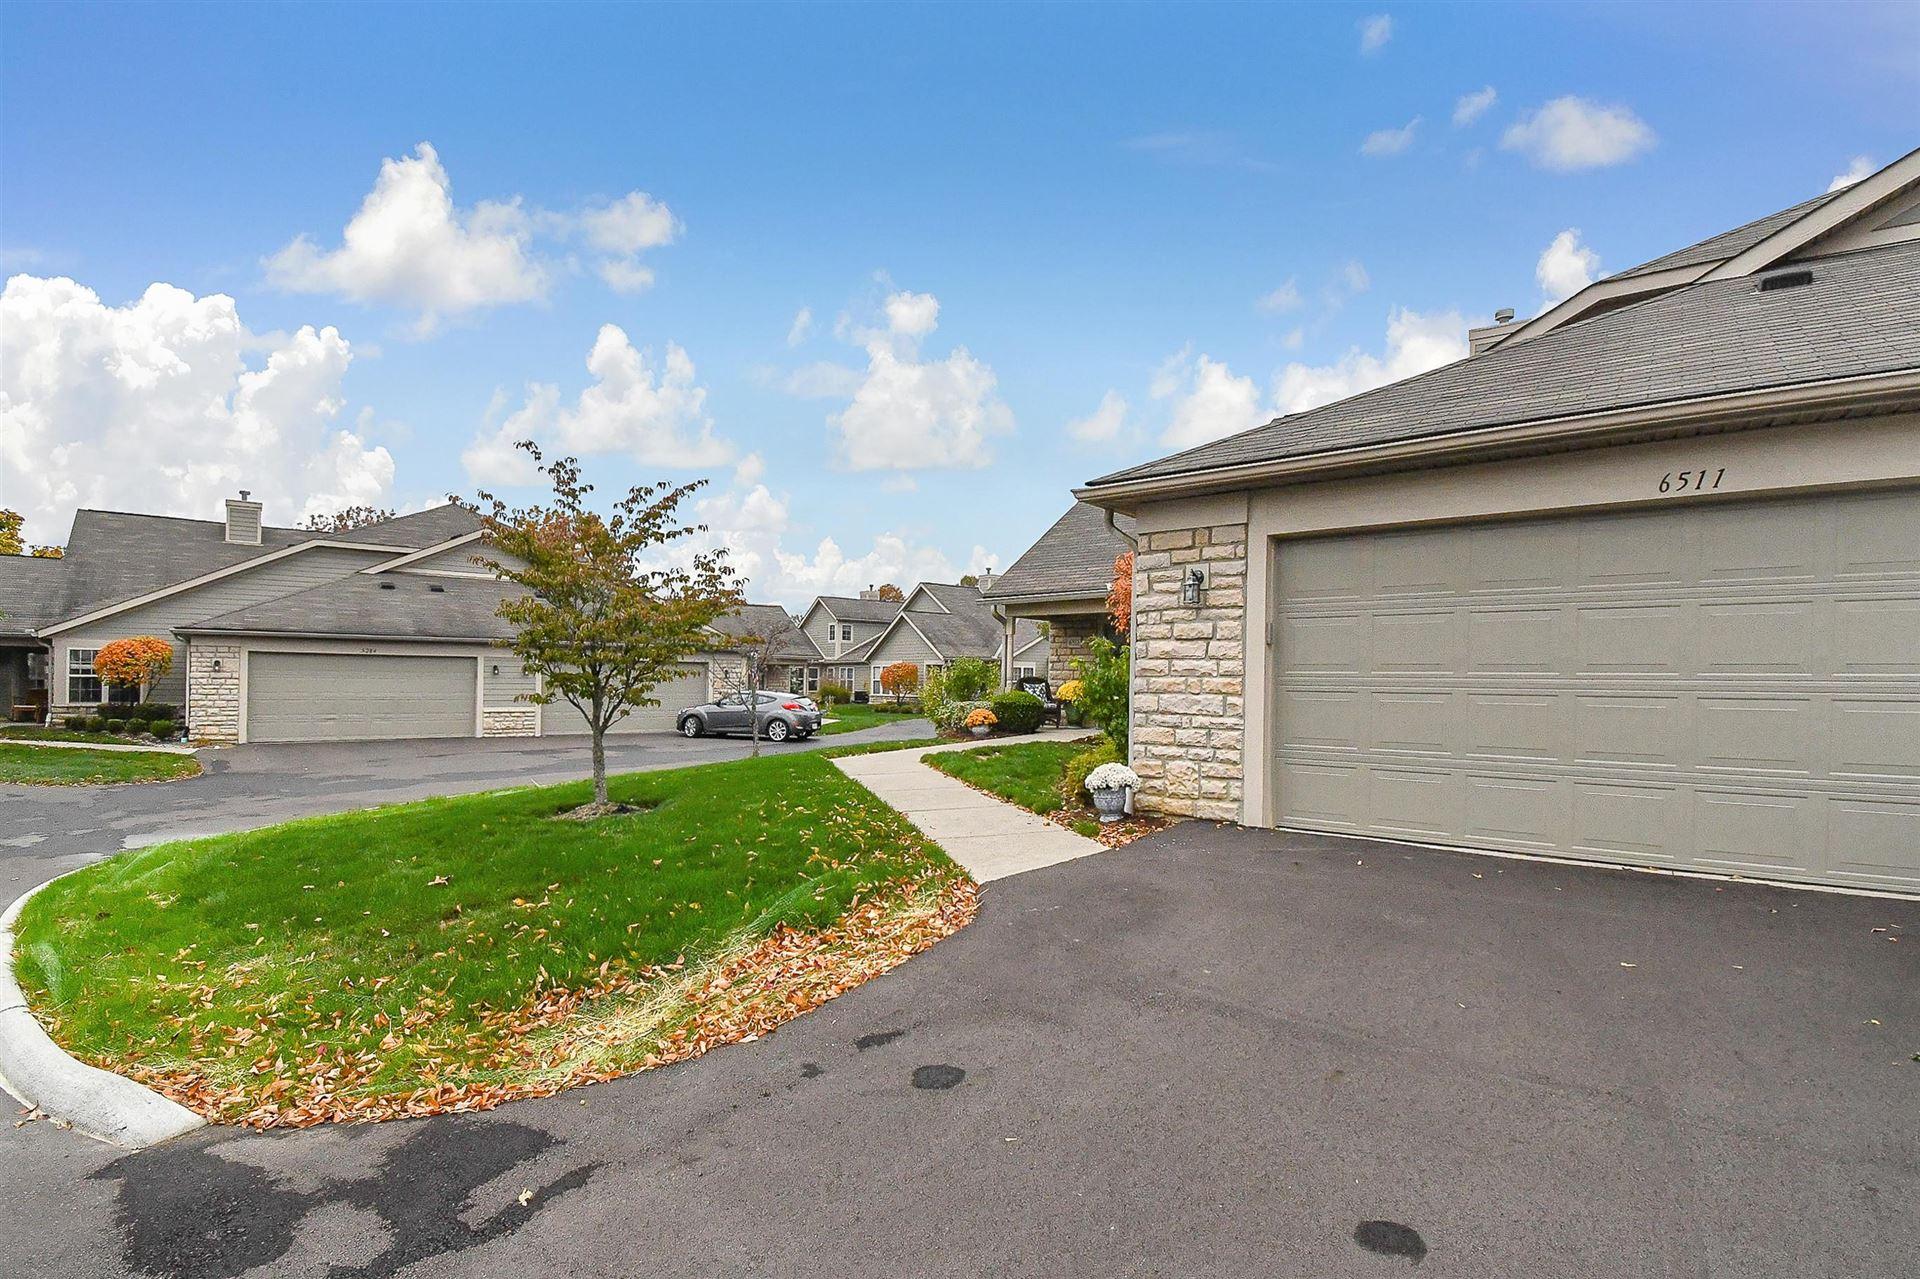 Photo of 6511 Hatcher Lane, Westerville, OH 43081 (MLS # 220038254)